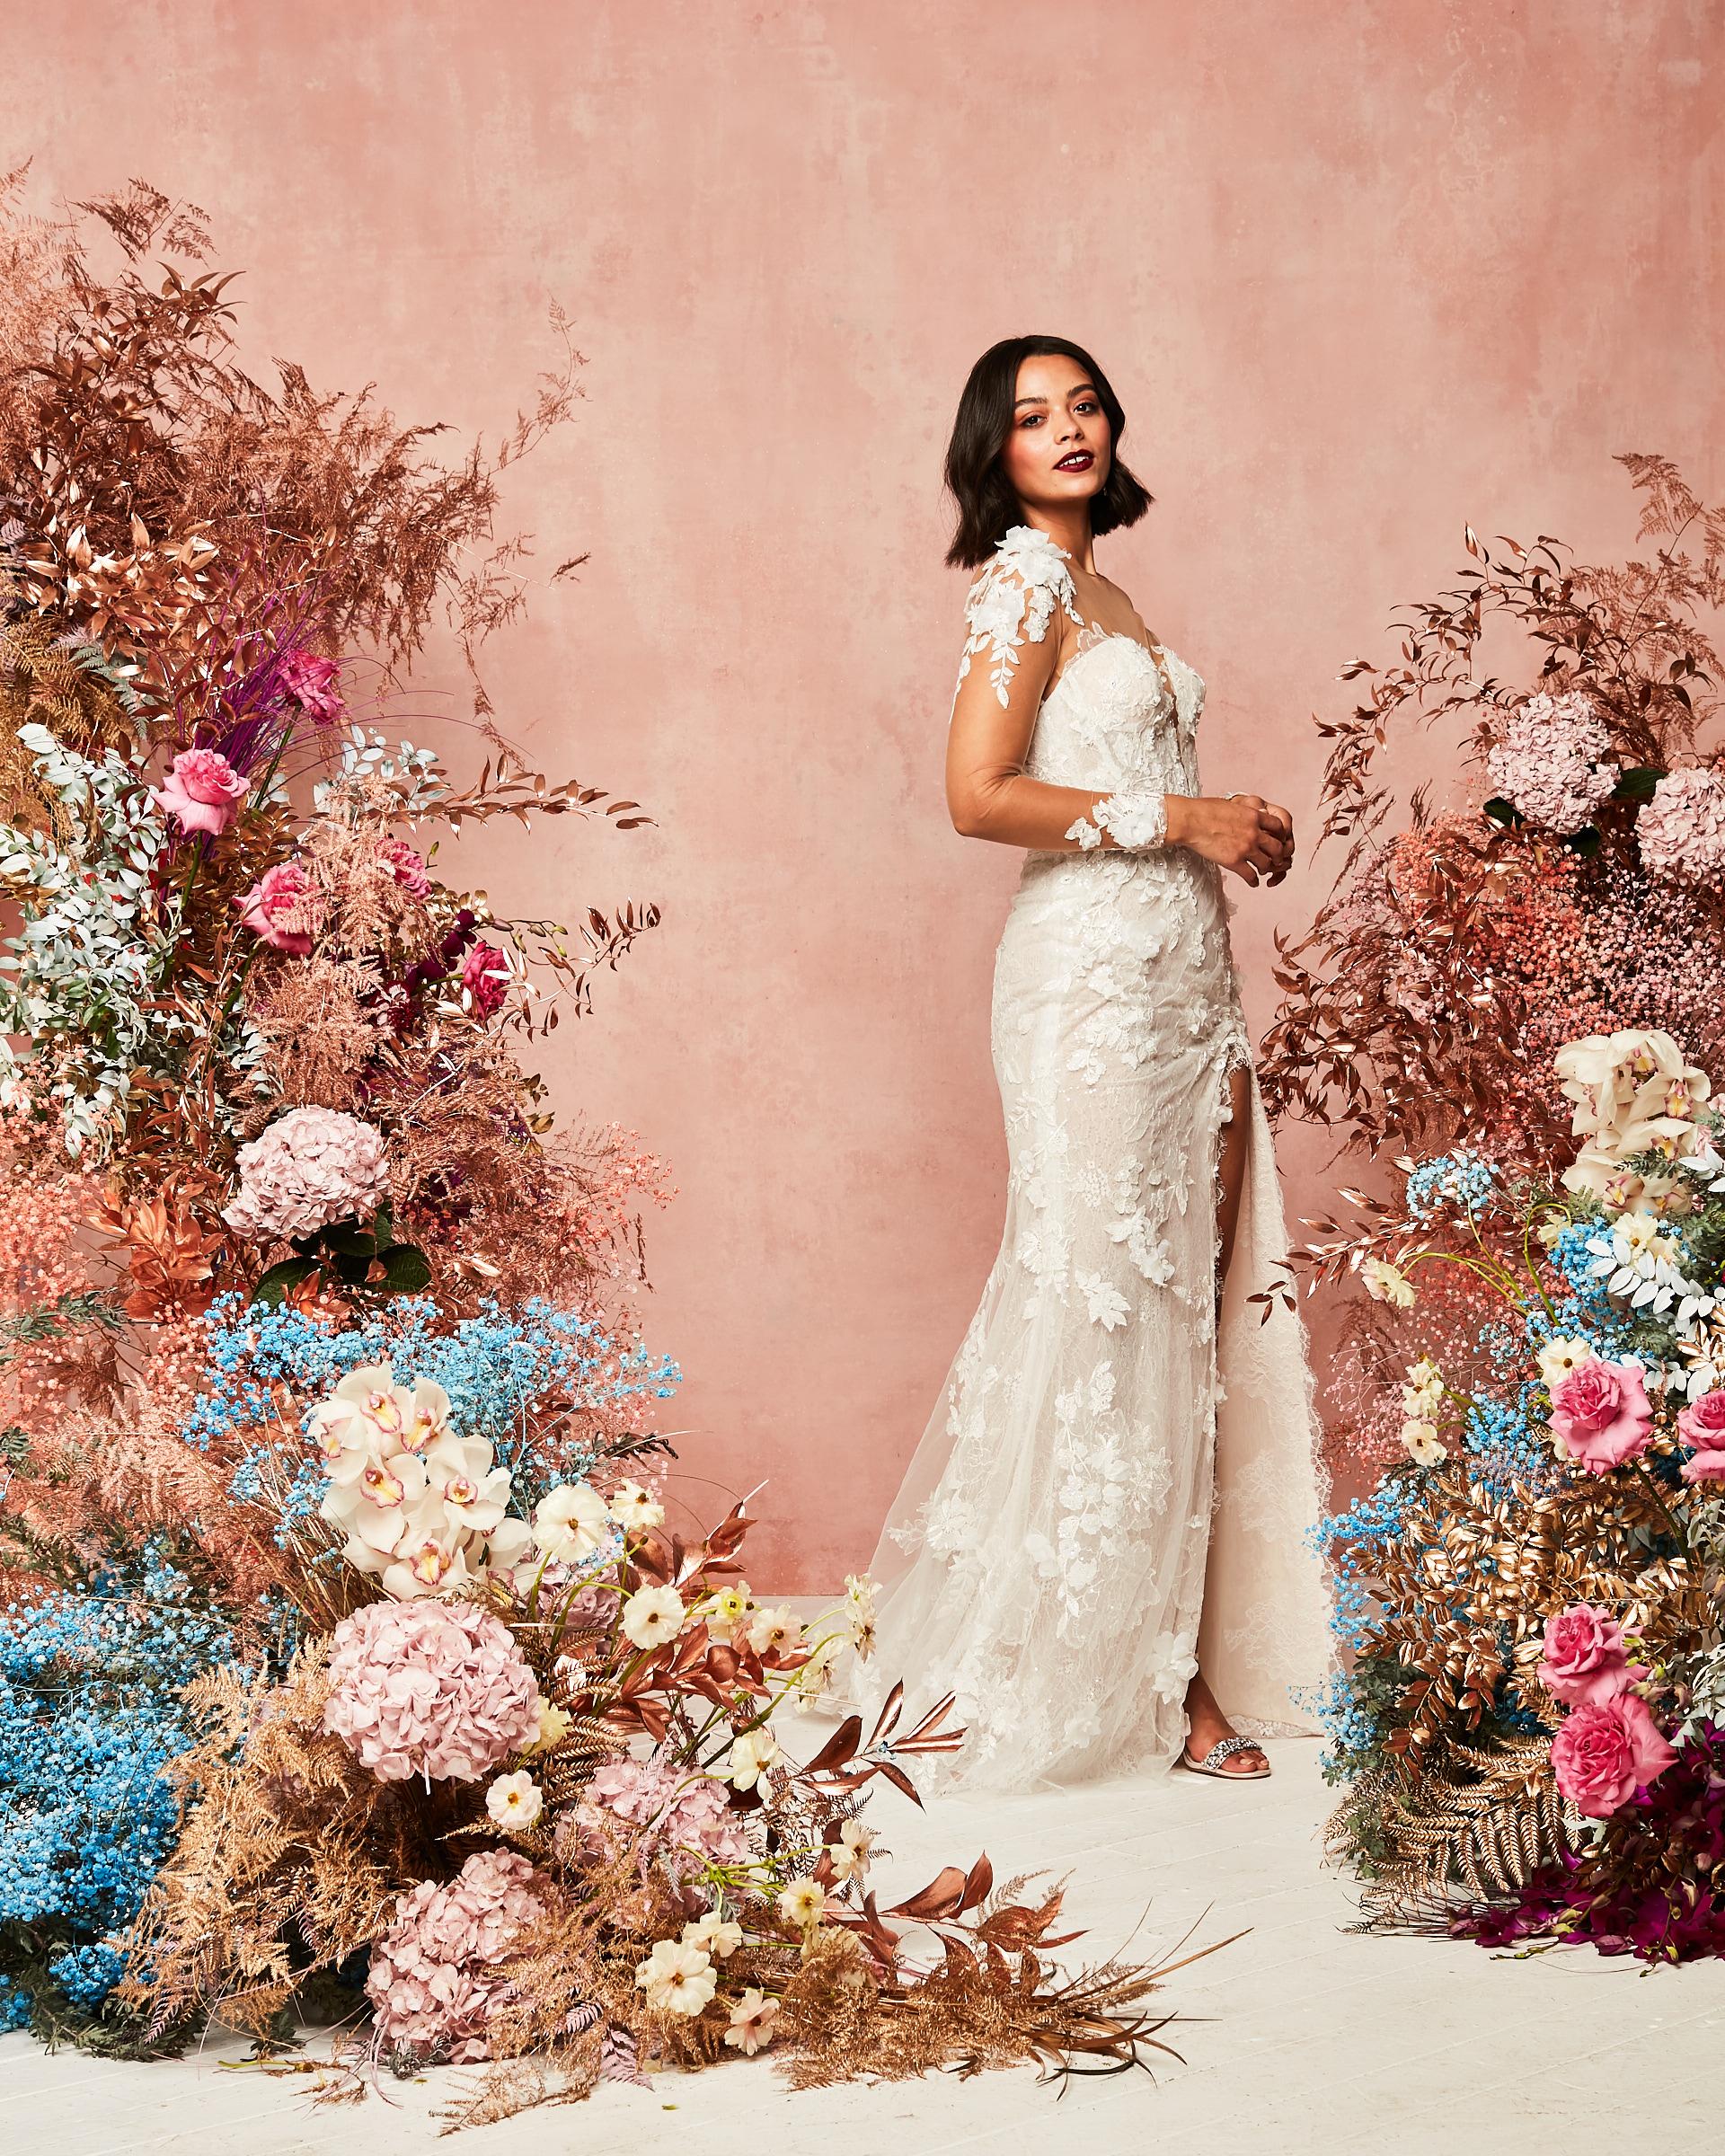 lace floral applique wedding dress david's bridal spring 2021 collection